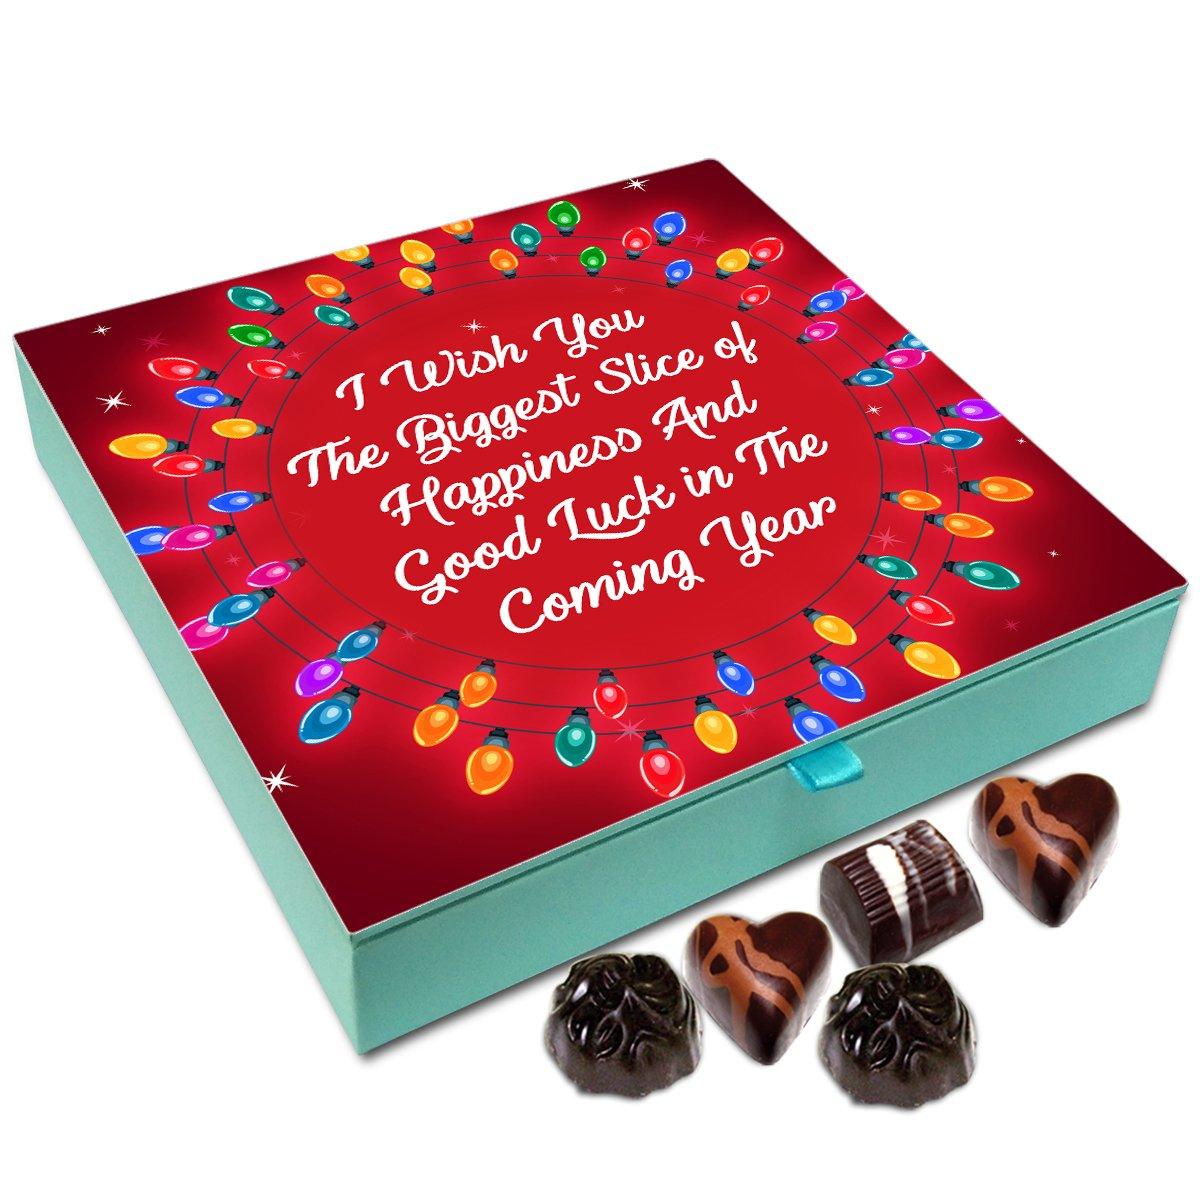 Chocholik New Year Chocolate Box – I Wish You Biggest Slice of Happiness On New Year Chocolate Box – 9pc